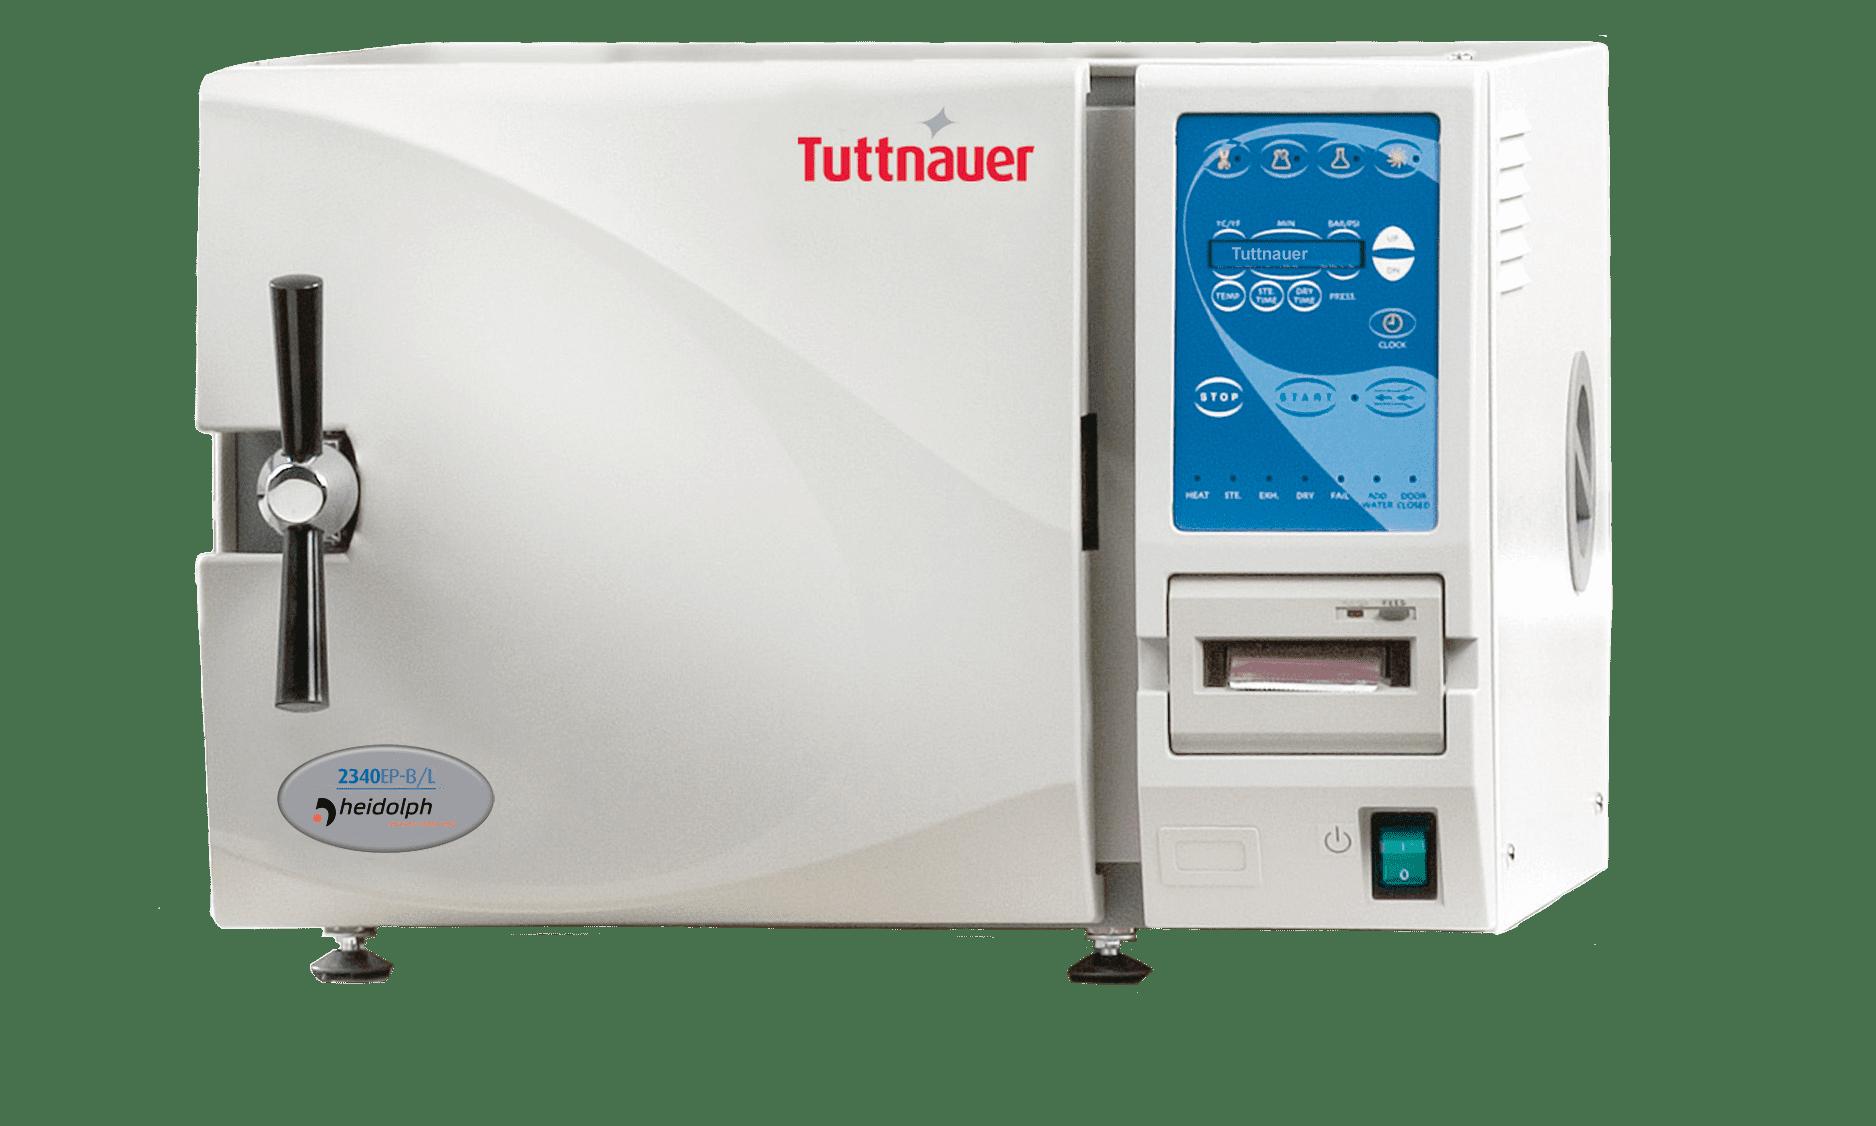 Heidolph Tuttnauer 3850EP 220V Autoclave